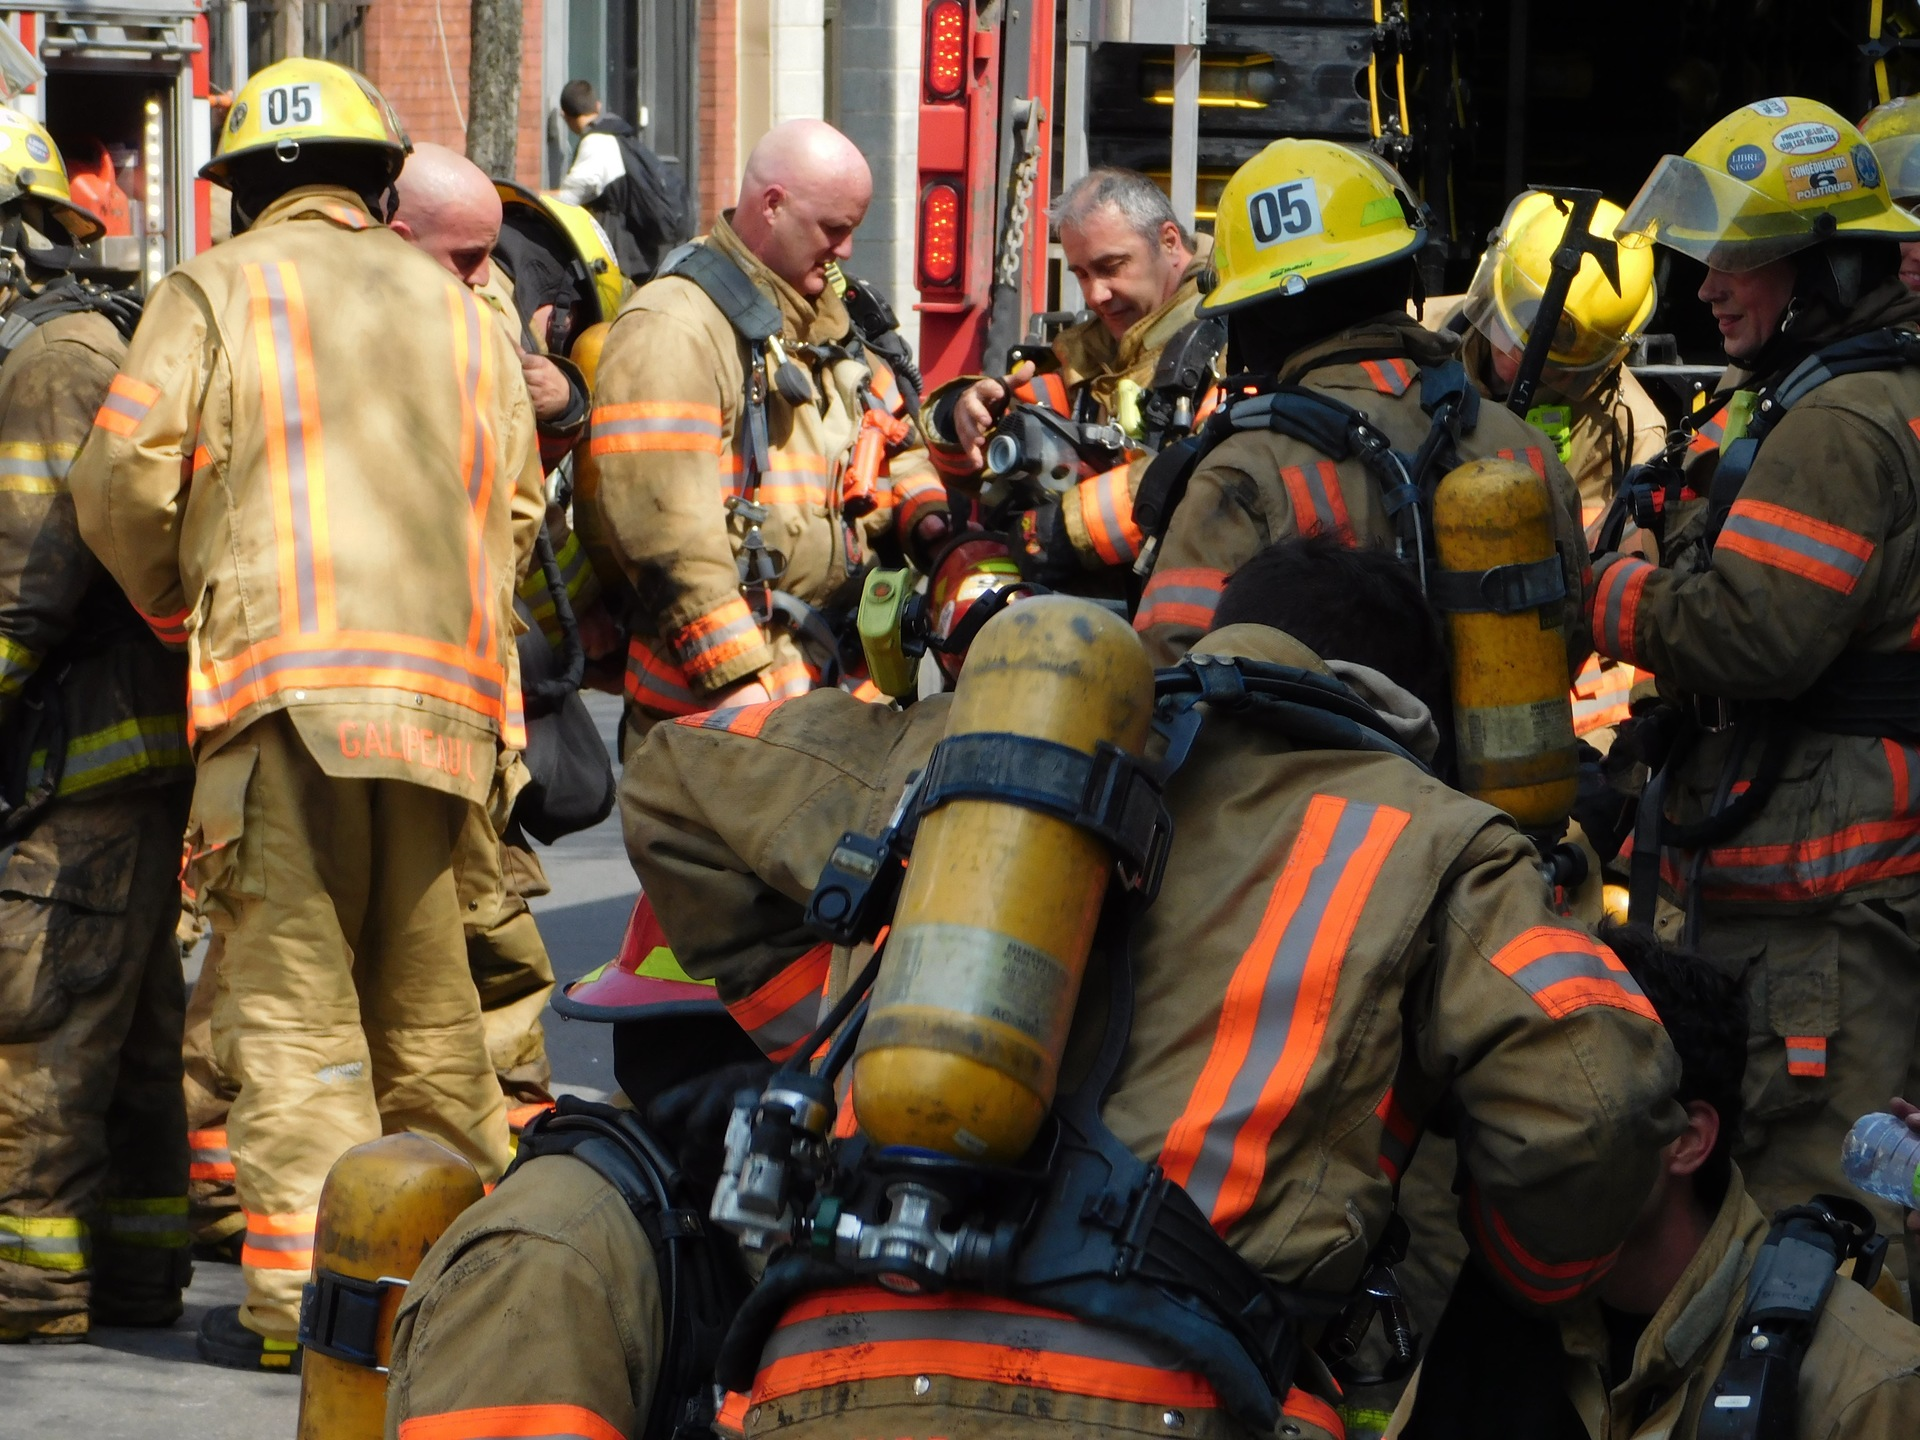 Montreal firemen | rick.cognyl.fournier, flame, uniform, fire